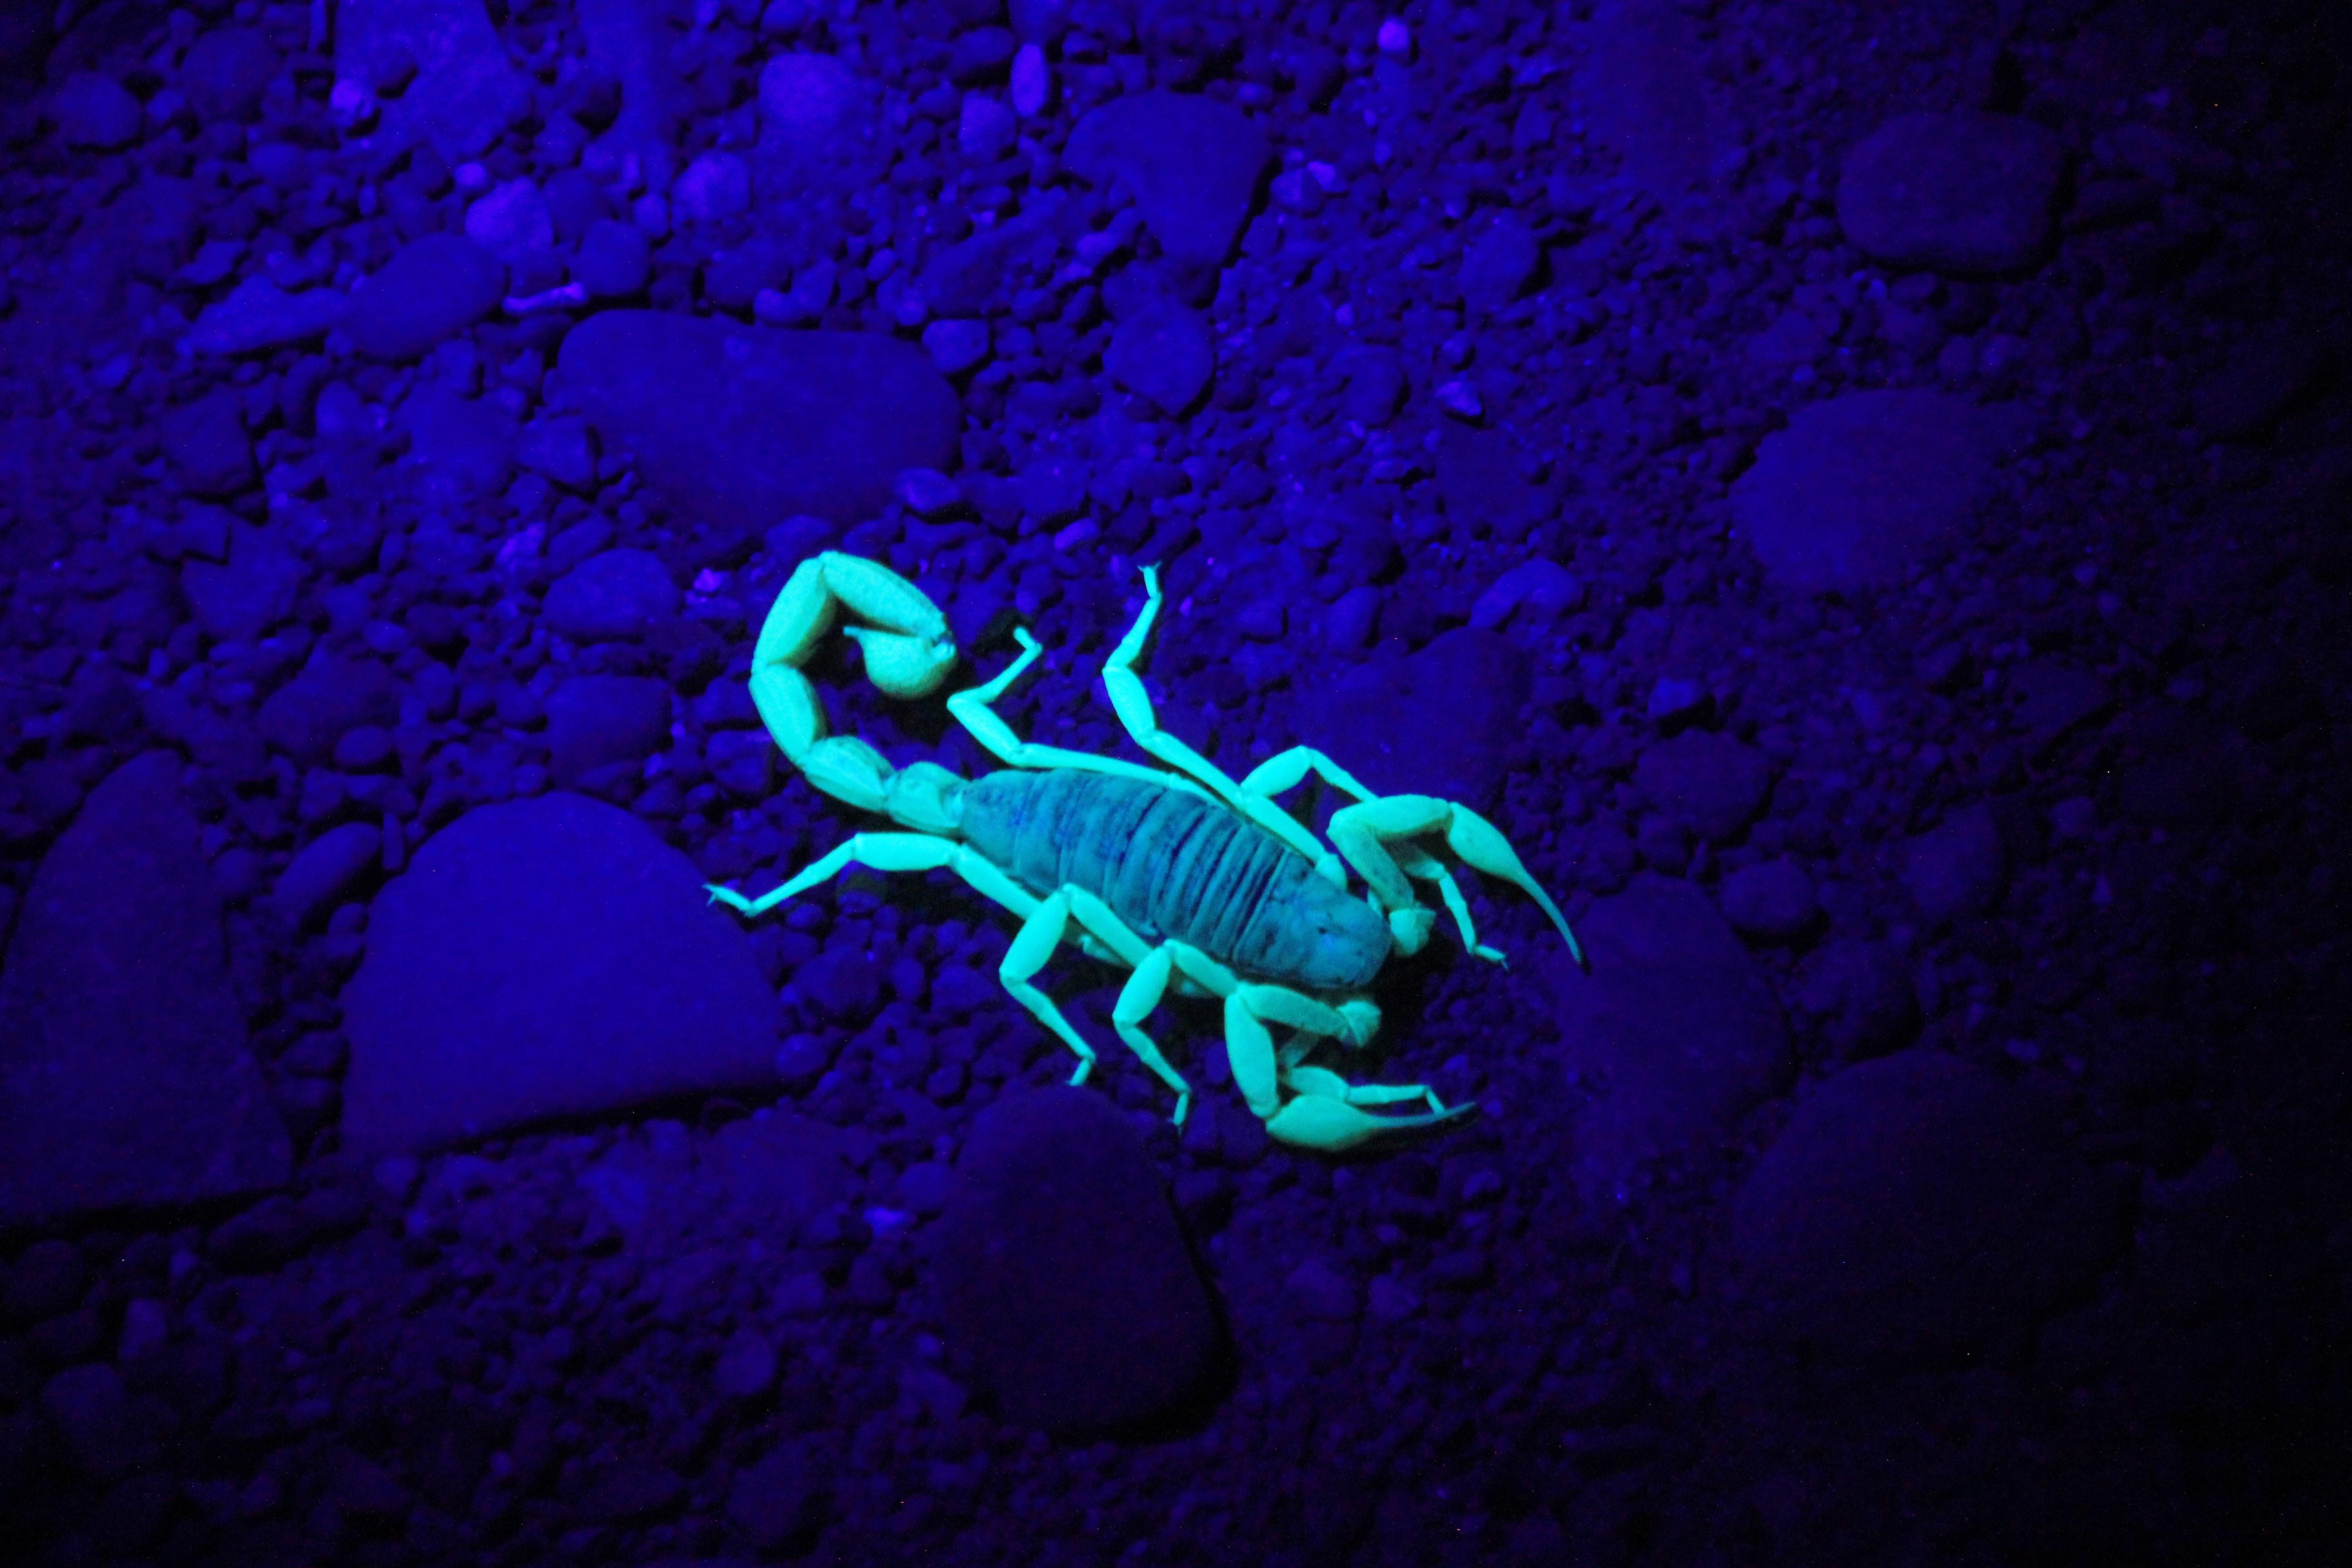 green scorpion on ground